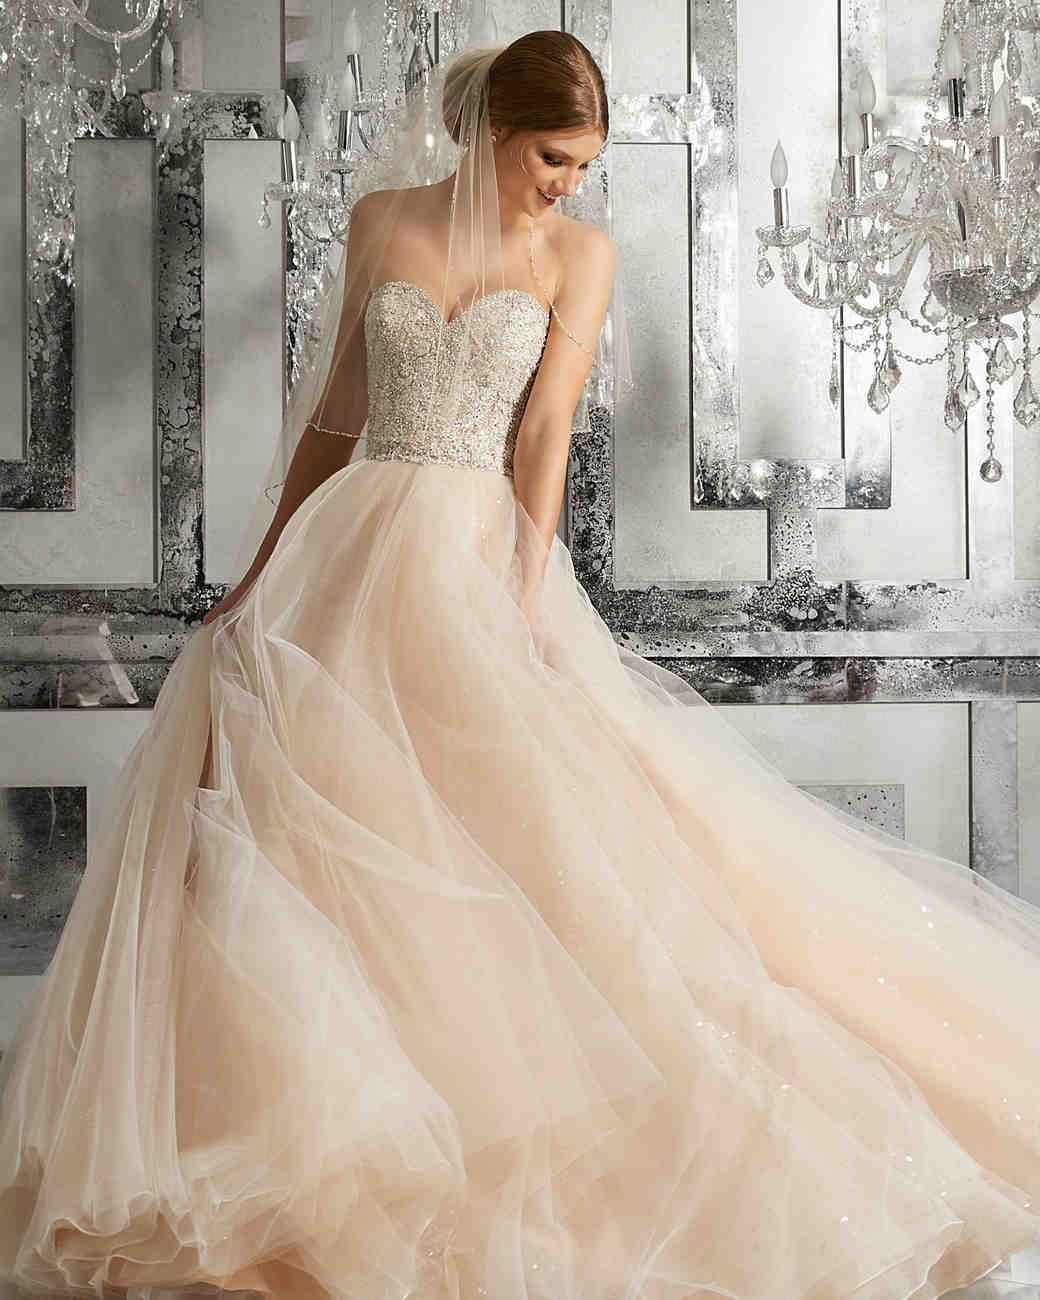 morilee wedding dress spring 2018 blush tulle skirt embellished bodice